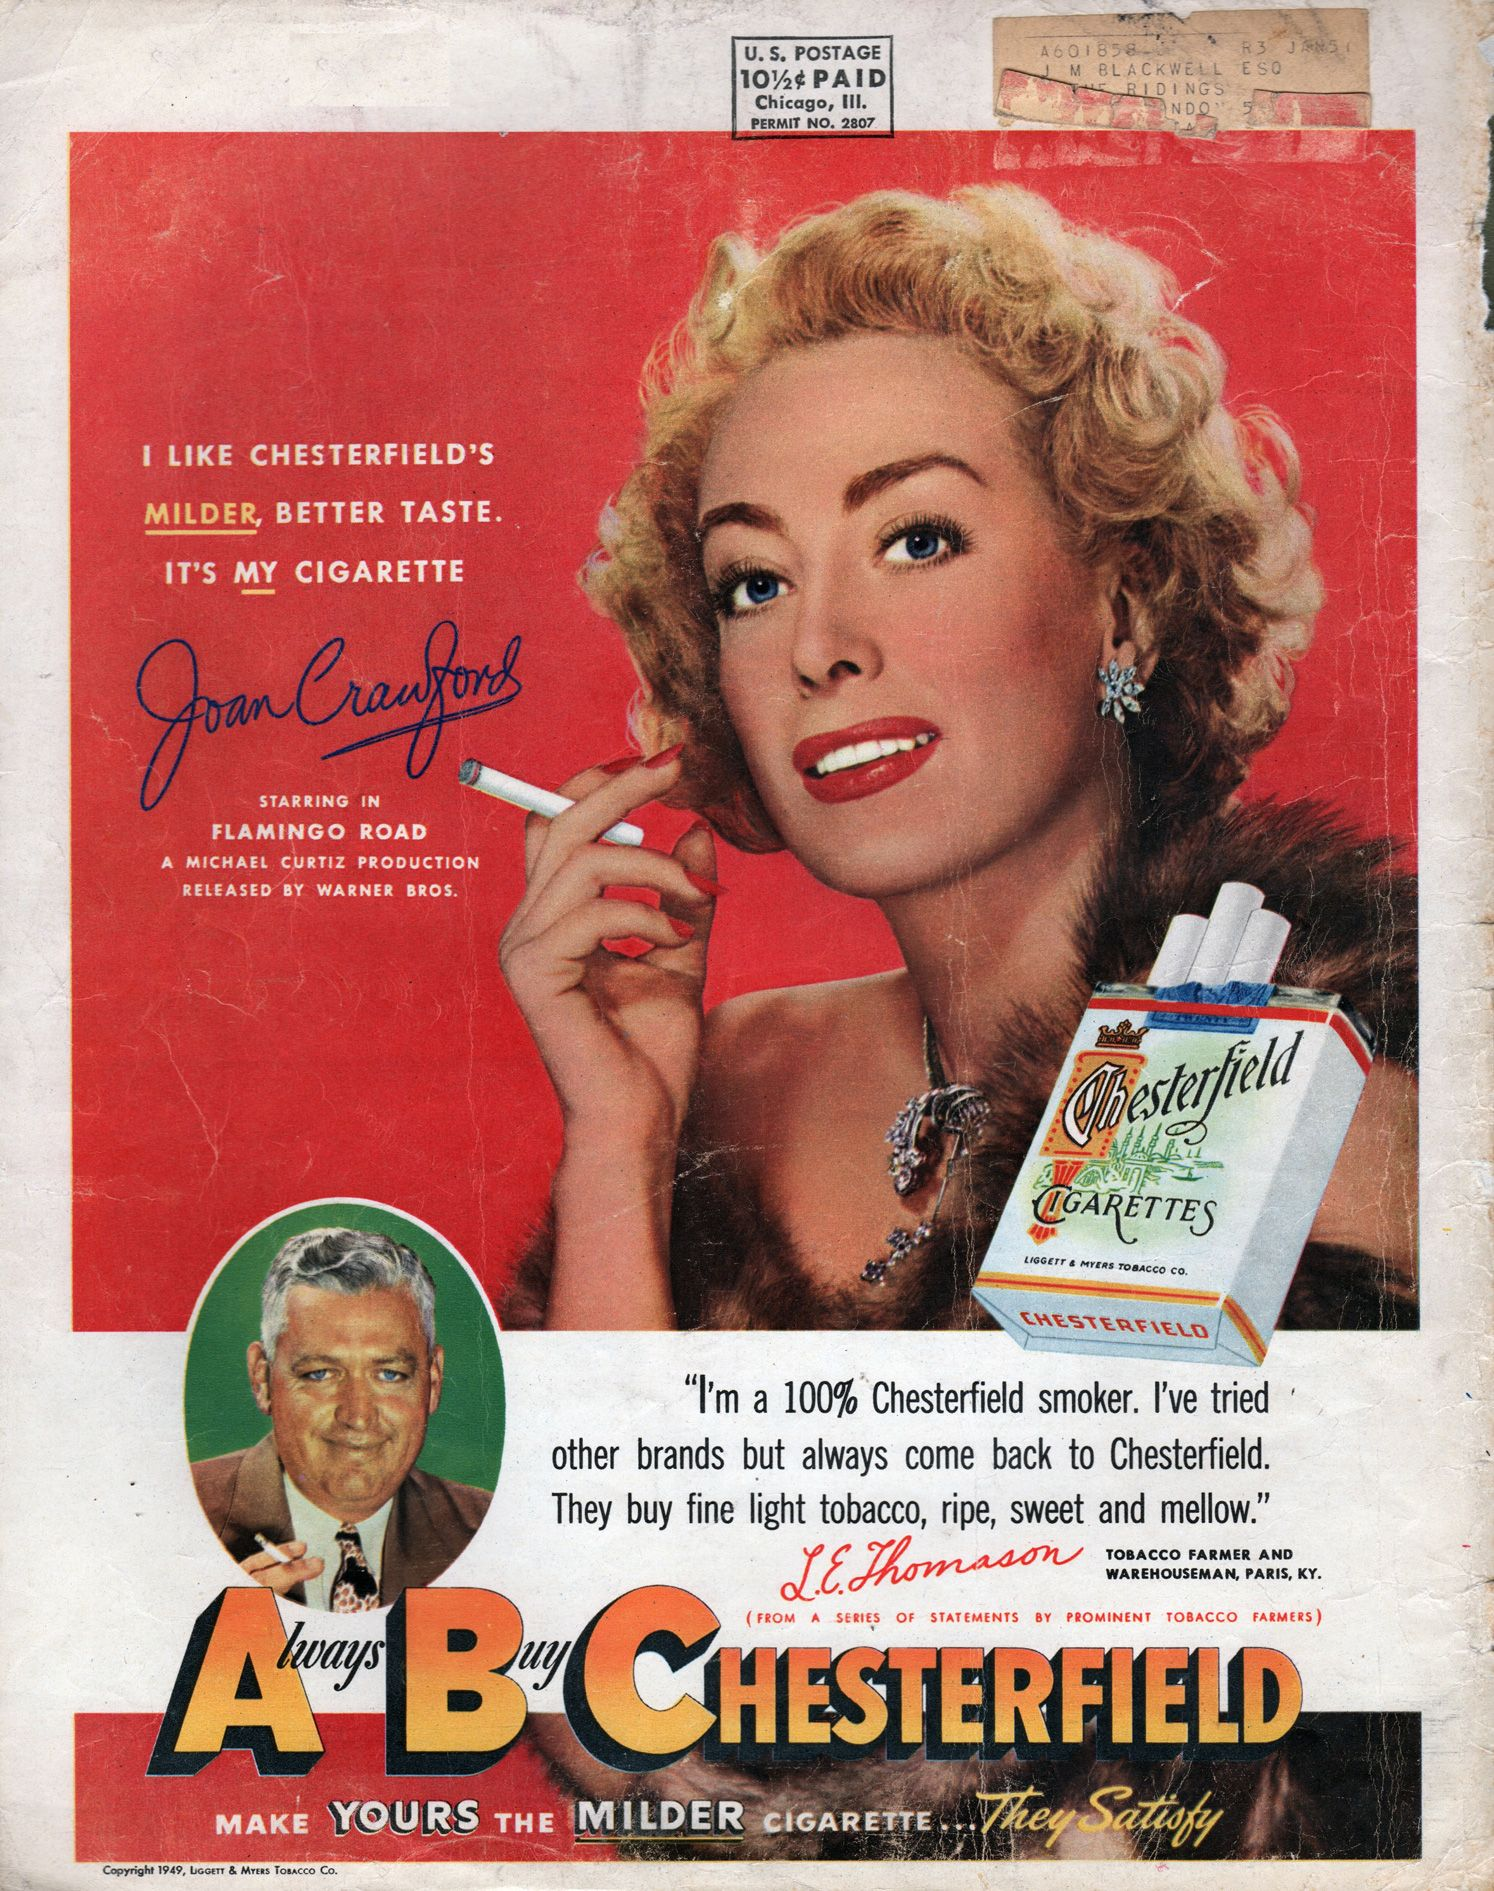 Chesterfield 1949, JoanCrawford